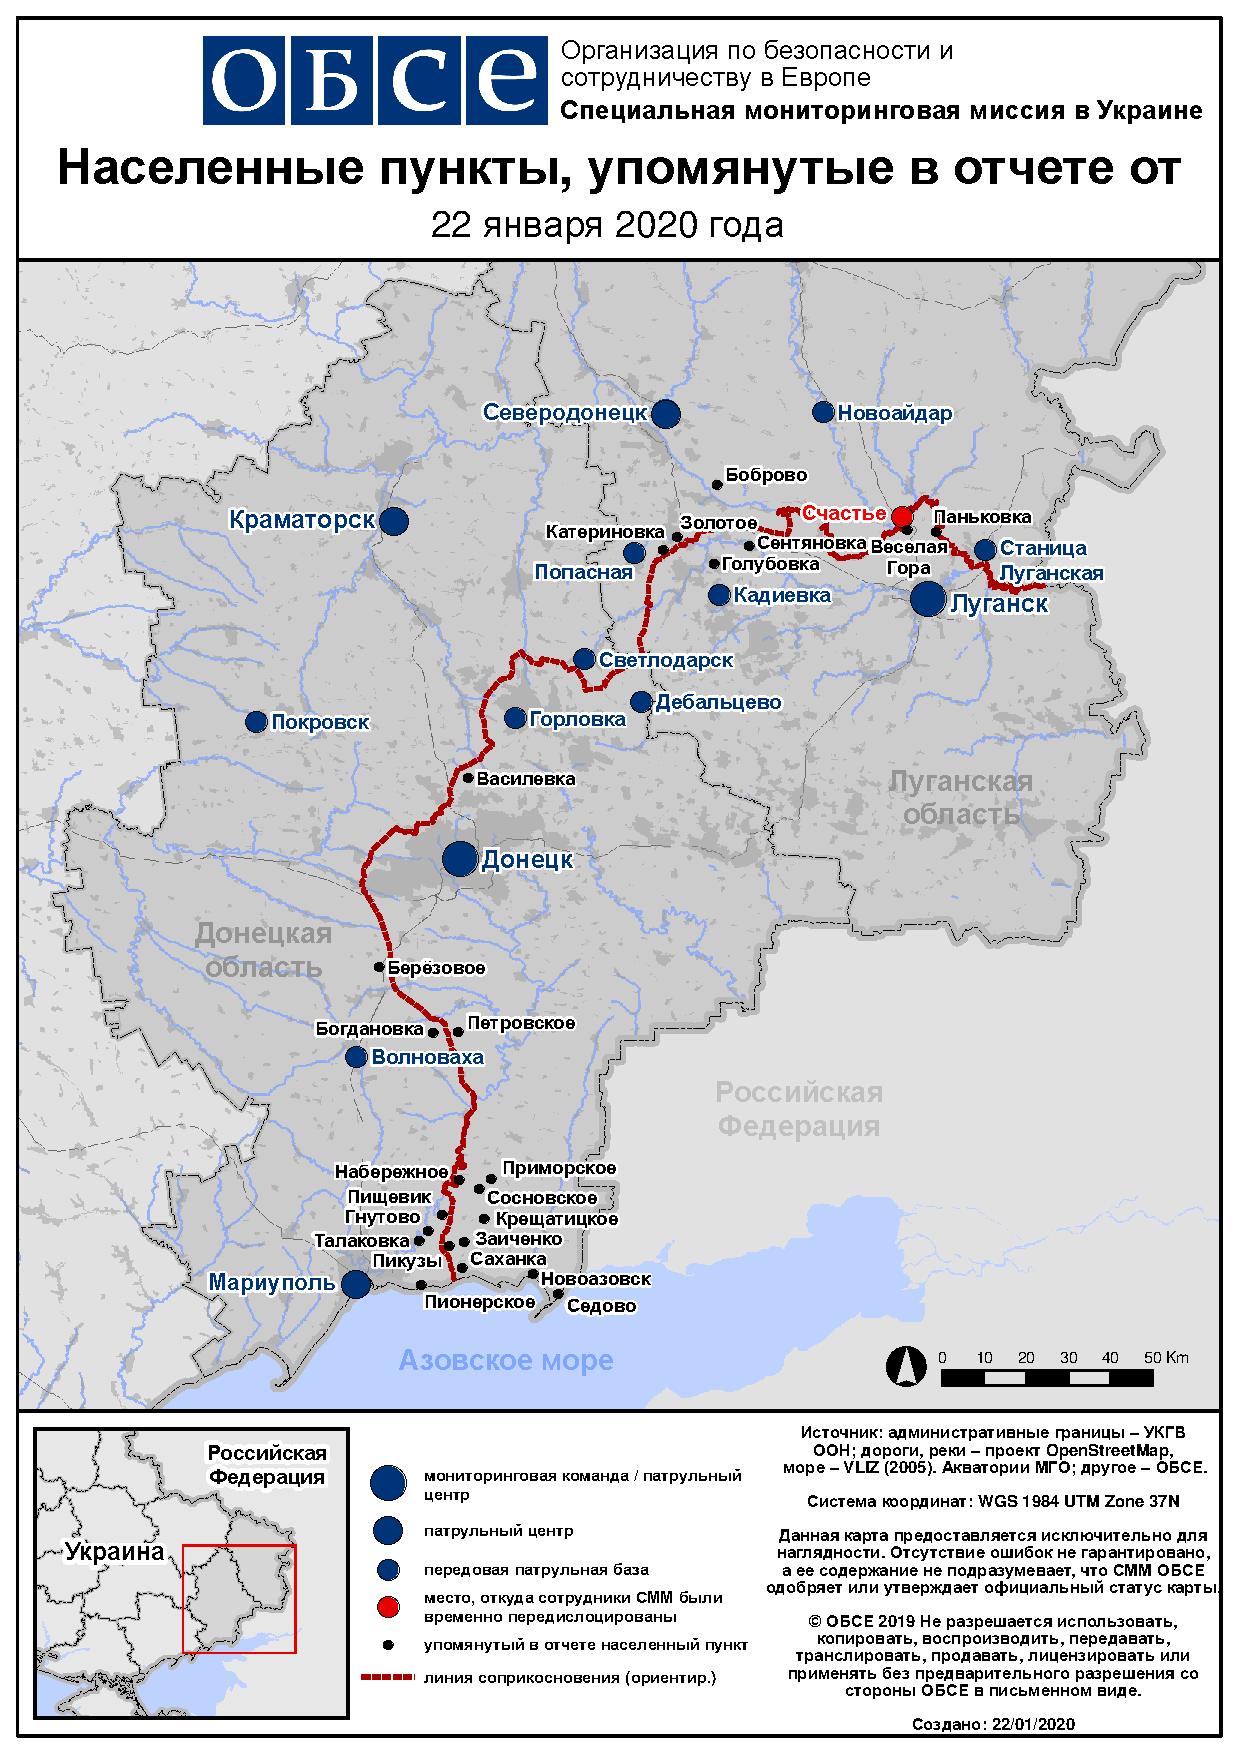 map_settlements--2020-01-21